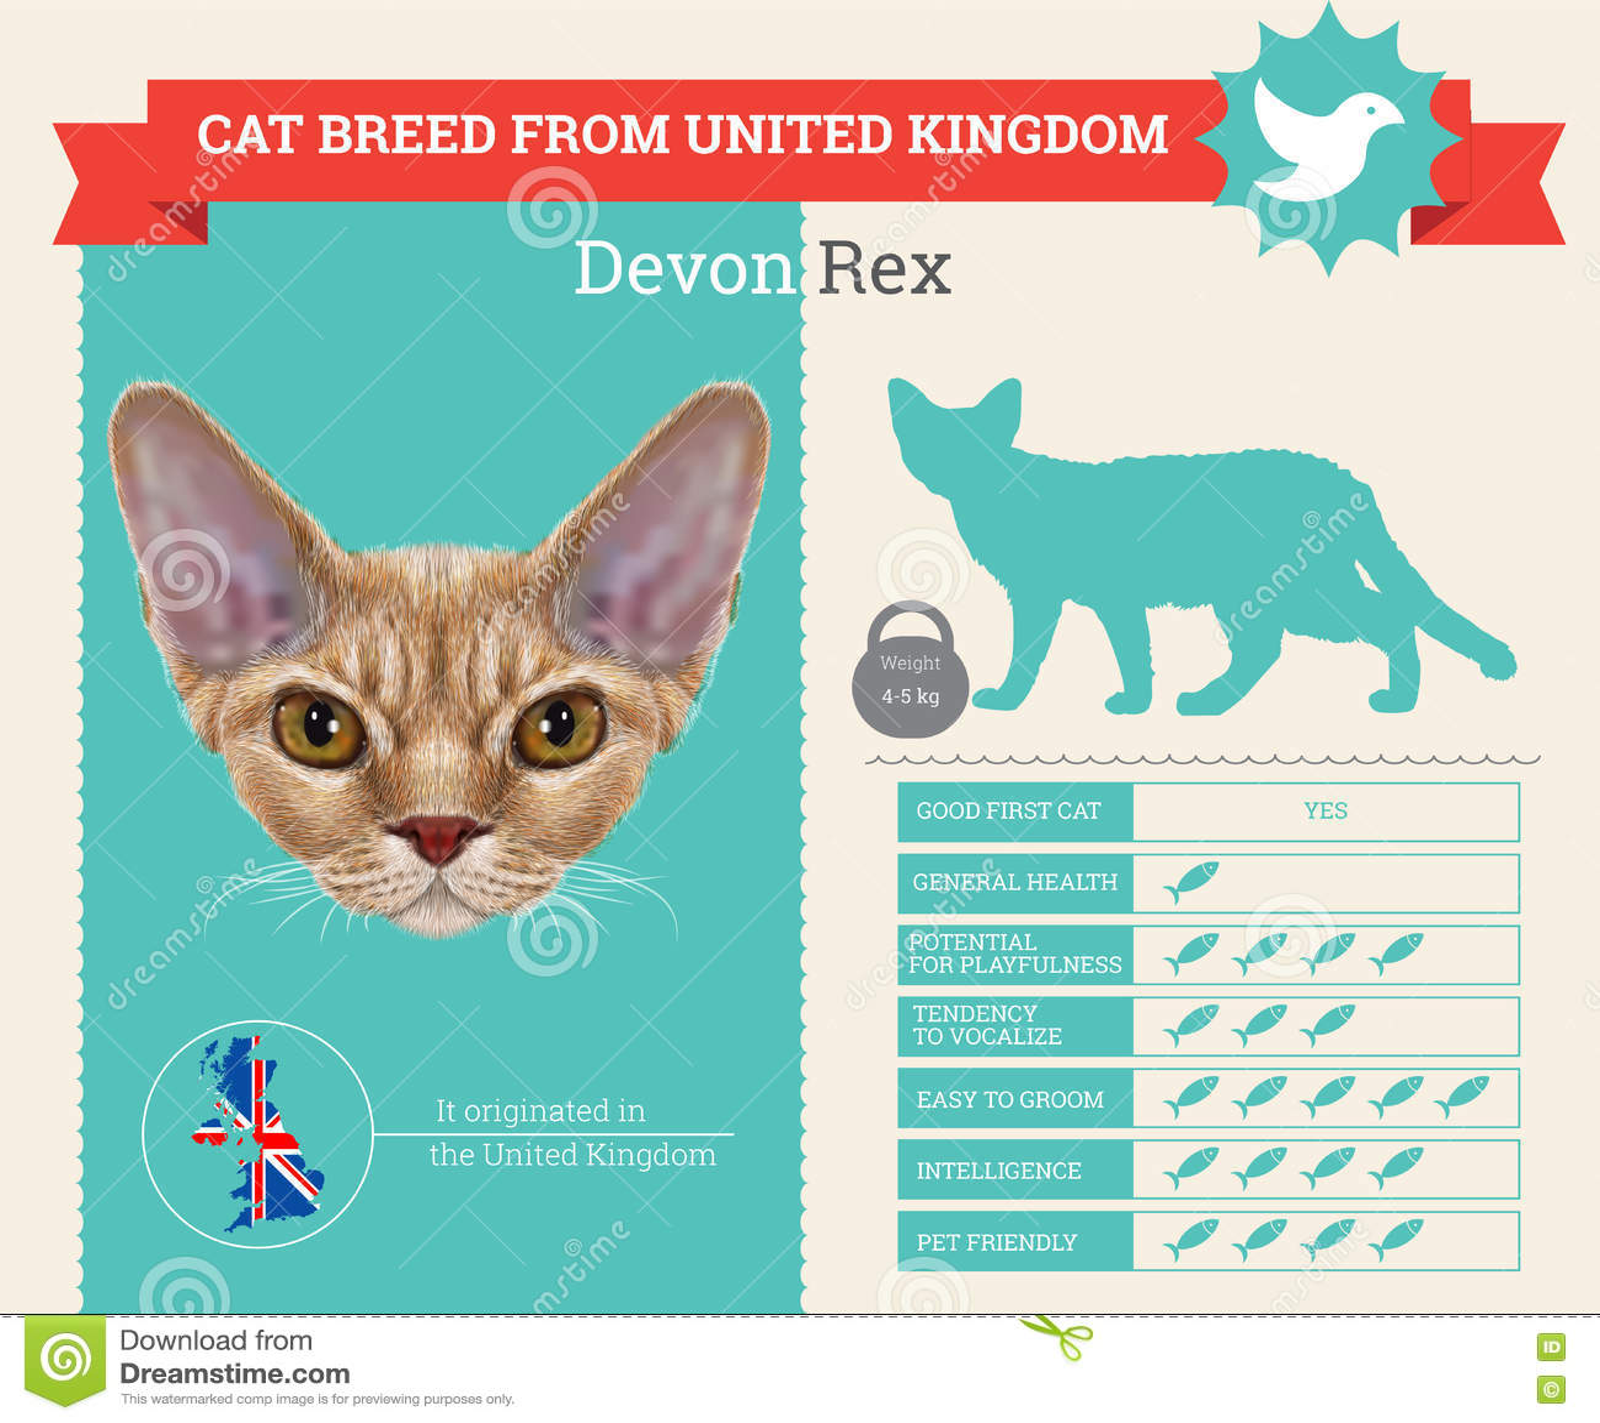 Devon Rex Cat avelinfographics